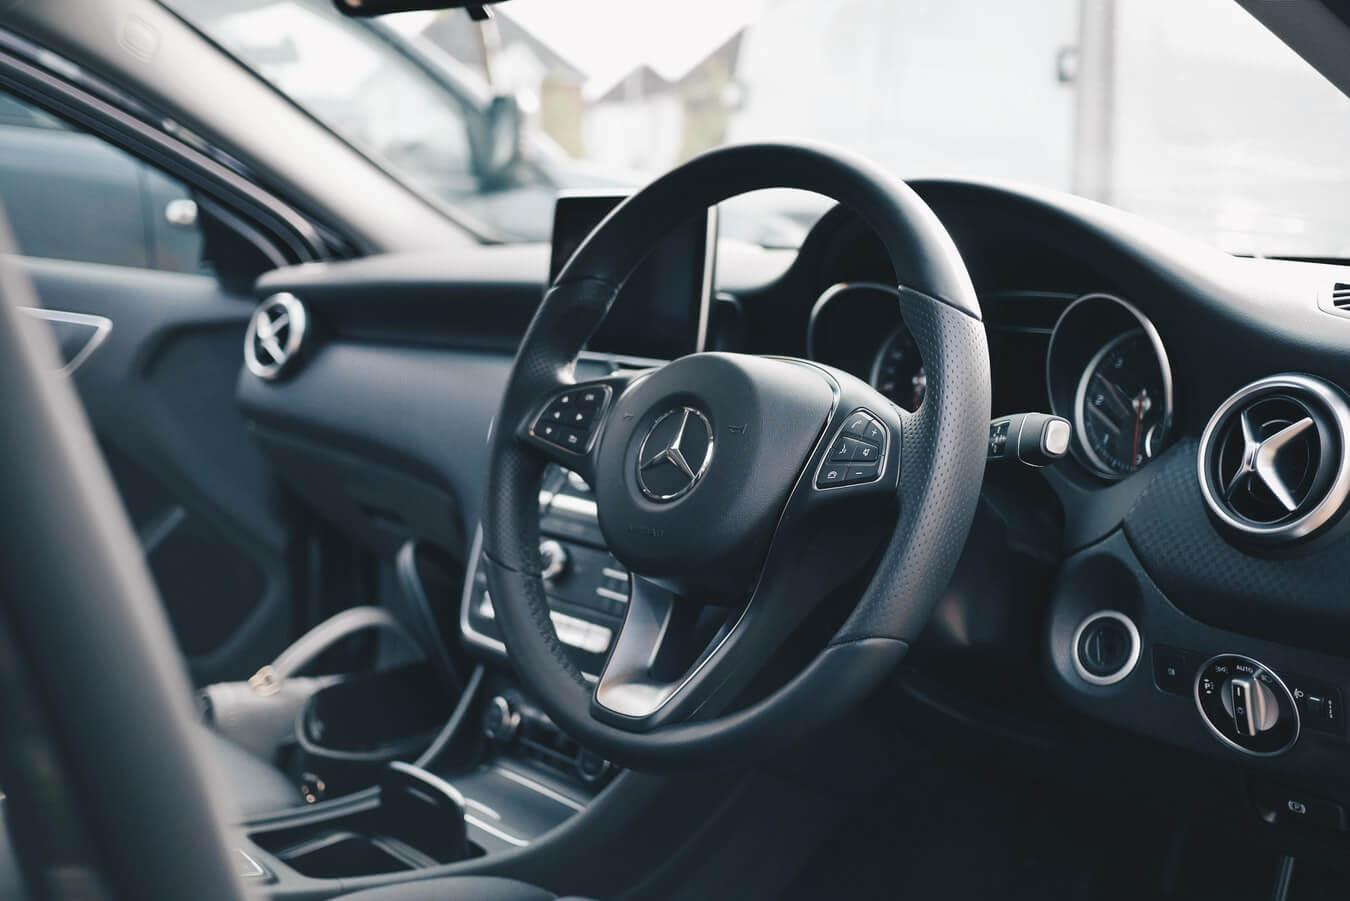 Parte interna de carro de luxo